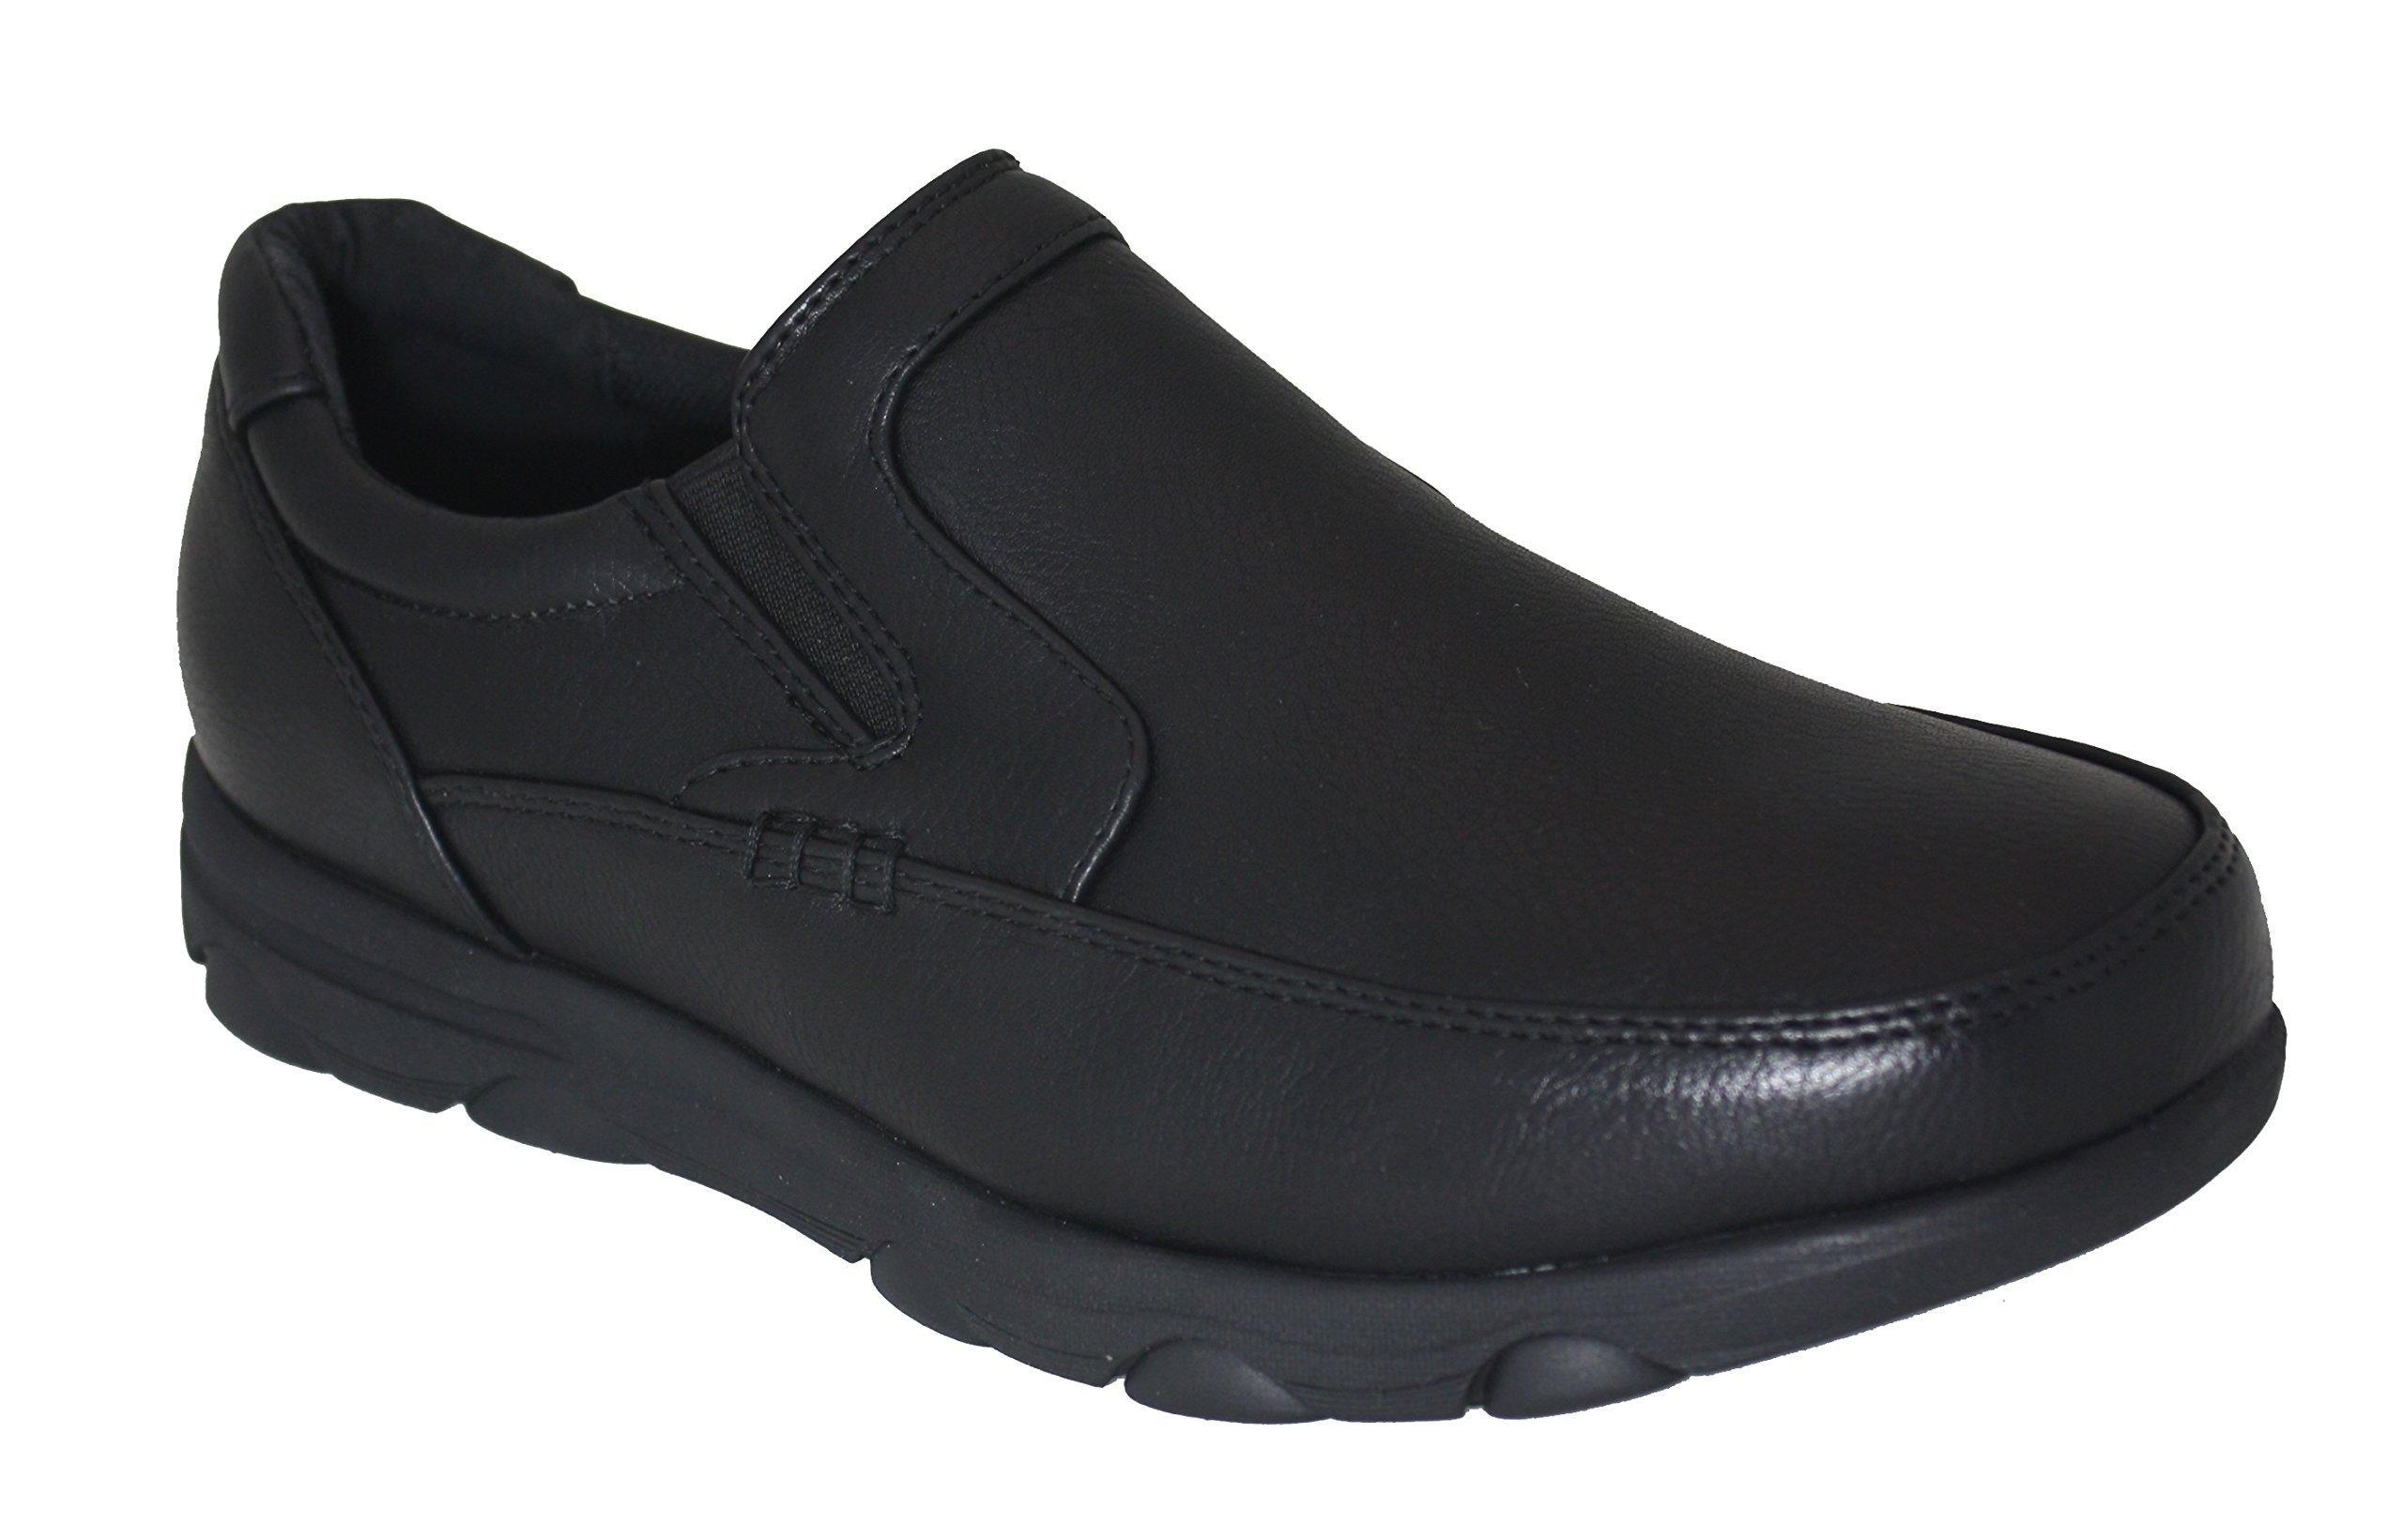 Gelato 8552 Moc Toe Slipon Slip & Oil Resistant Men's Comfort Work Shoe with Water & Stain Resistant Upper Black 7.5 D(M) US by Gelato